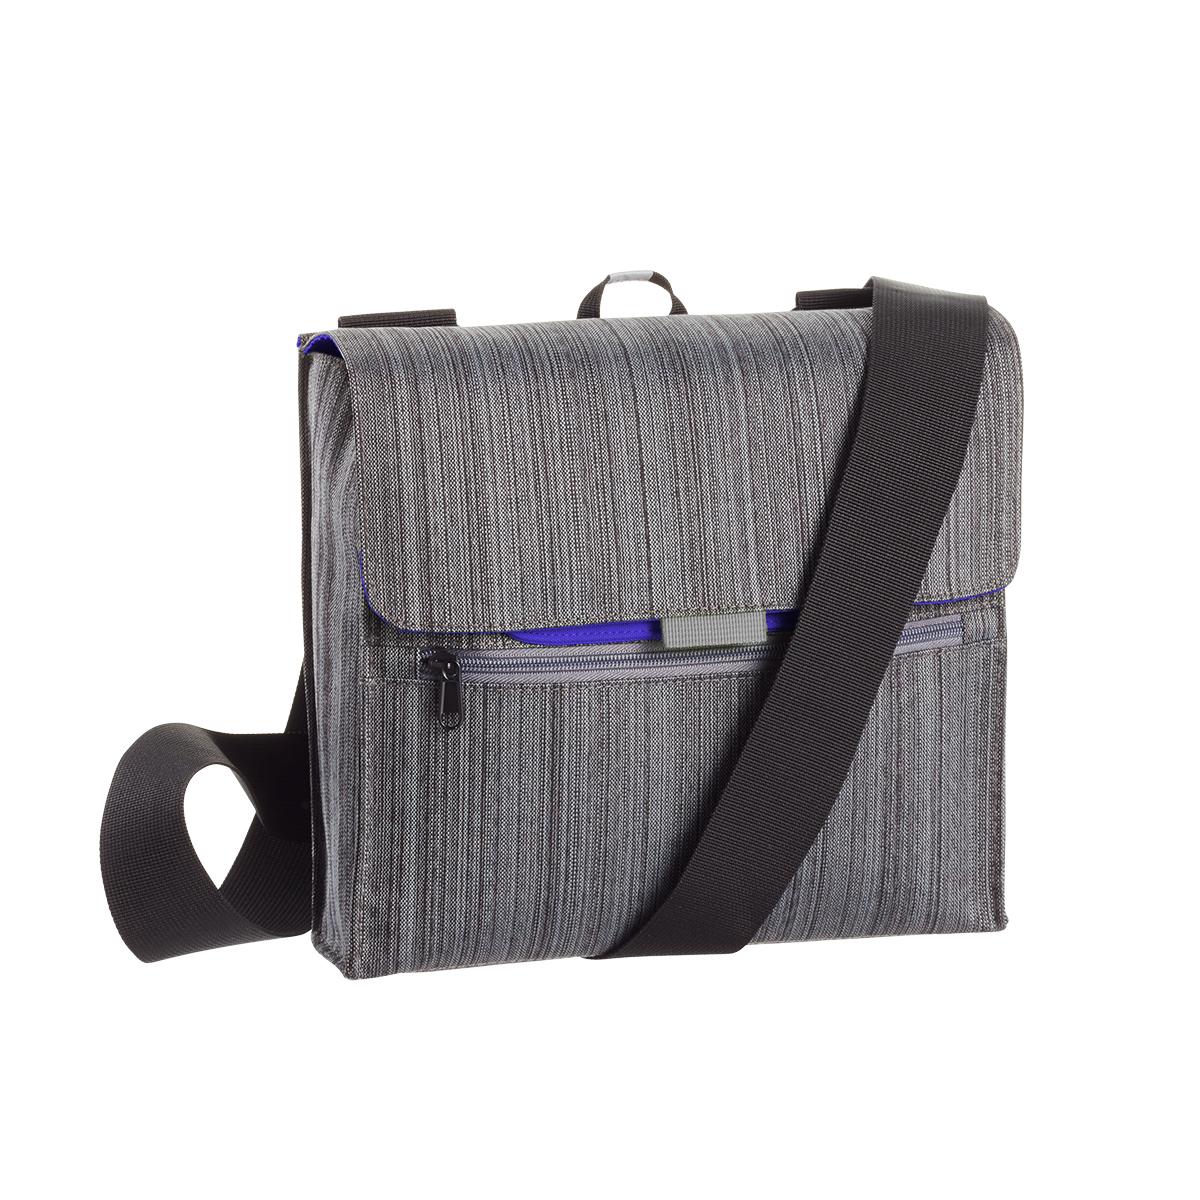 Bag & Seatback Organizer